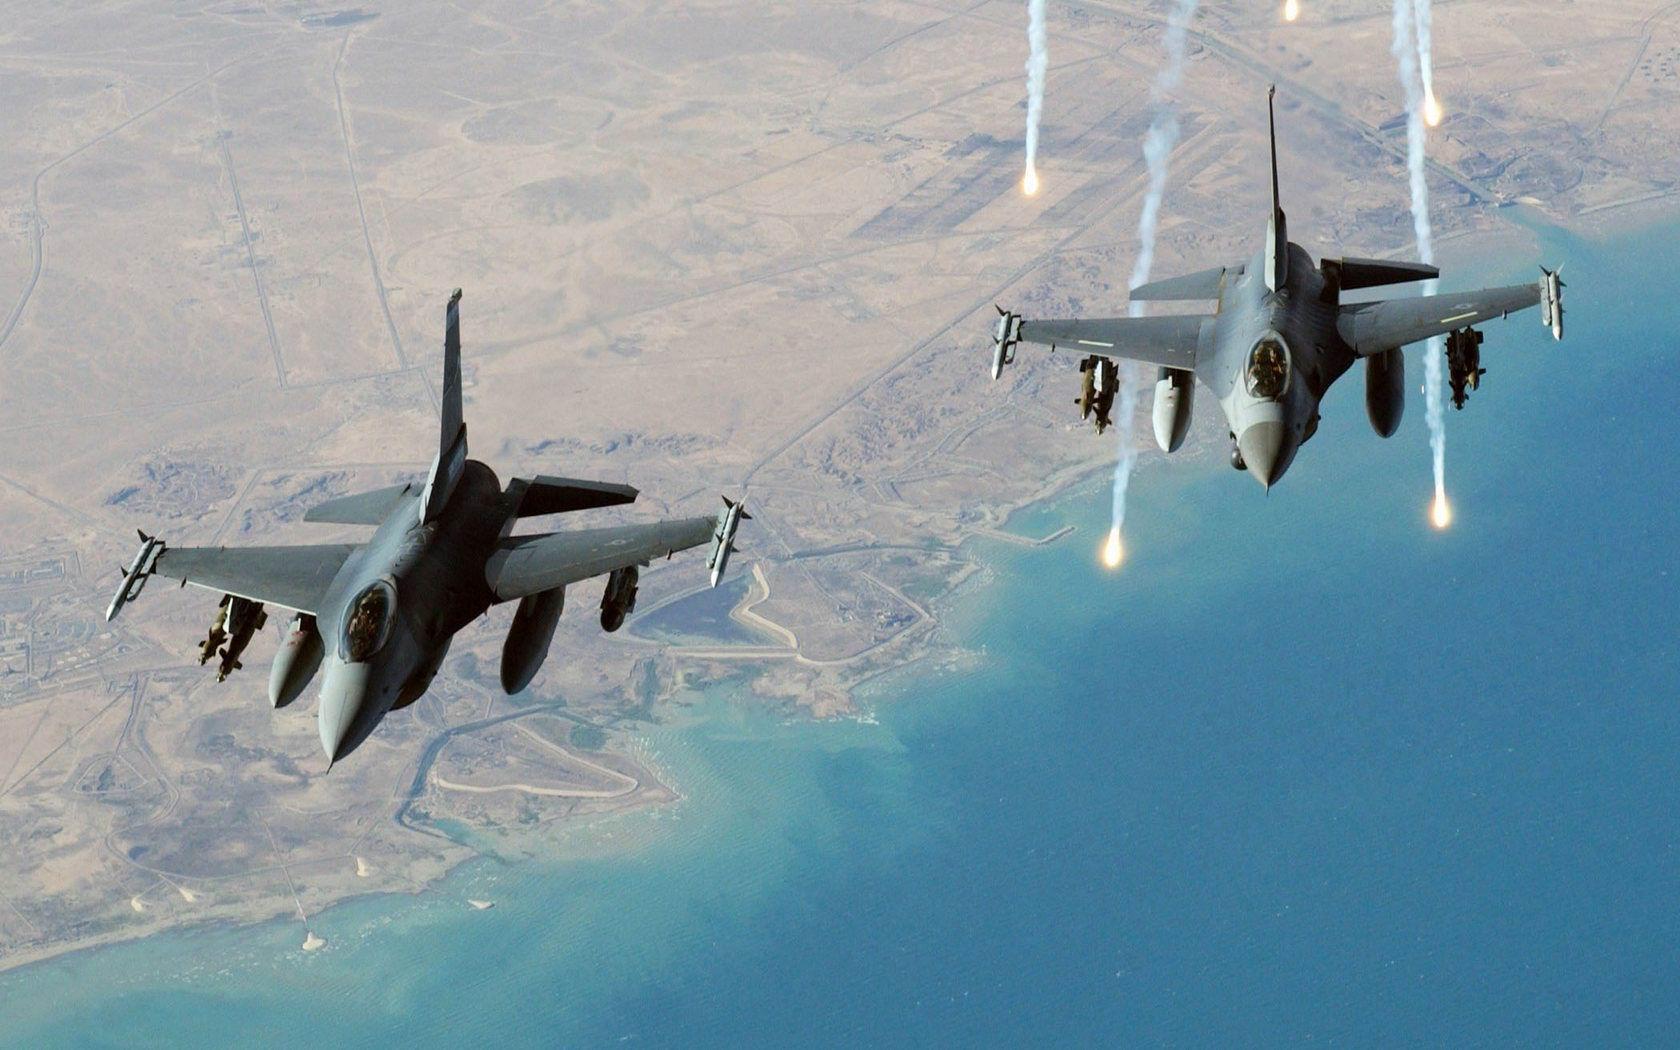 Air Attack Plane Air Attack Military Airplanes